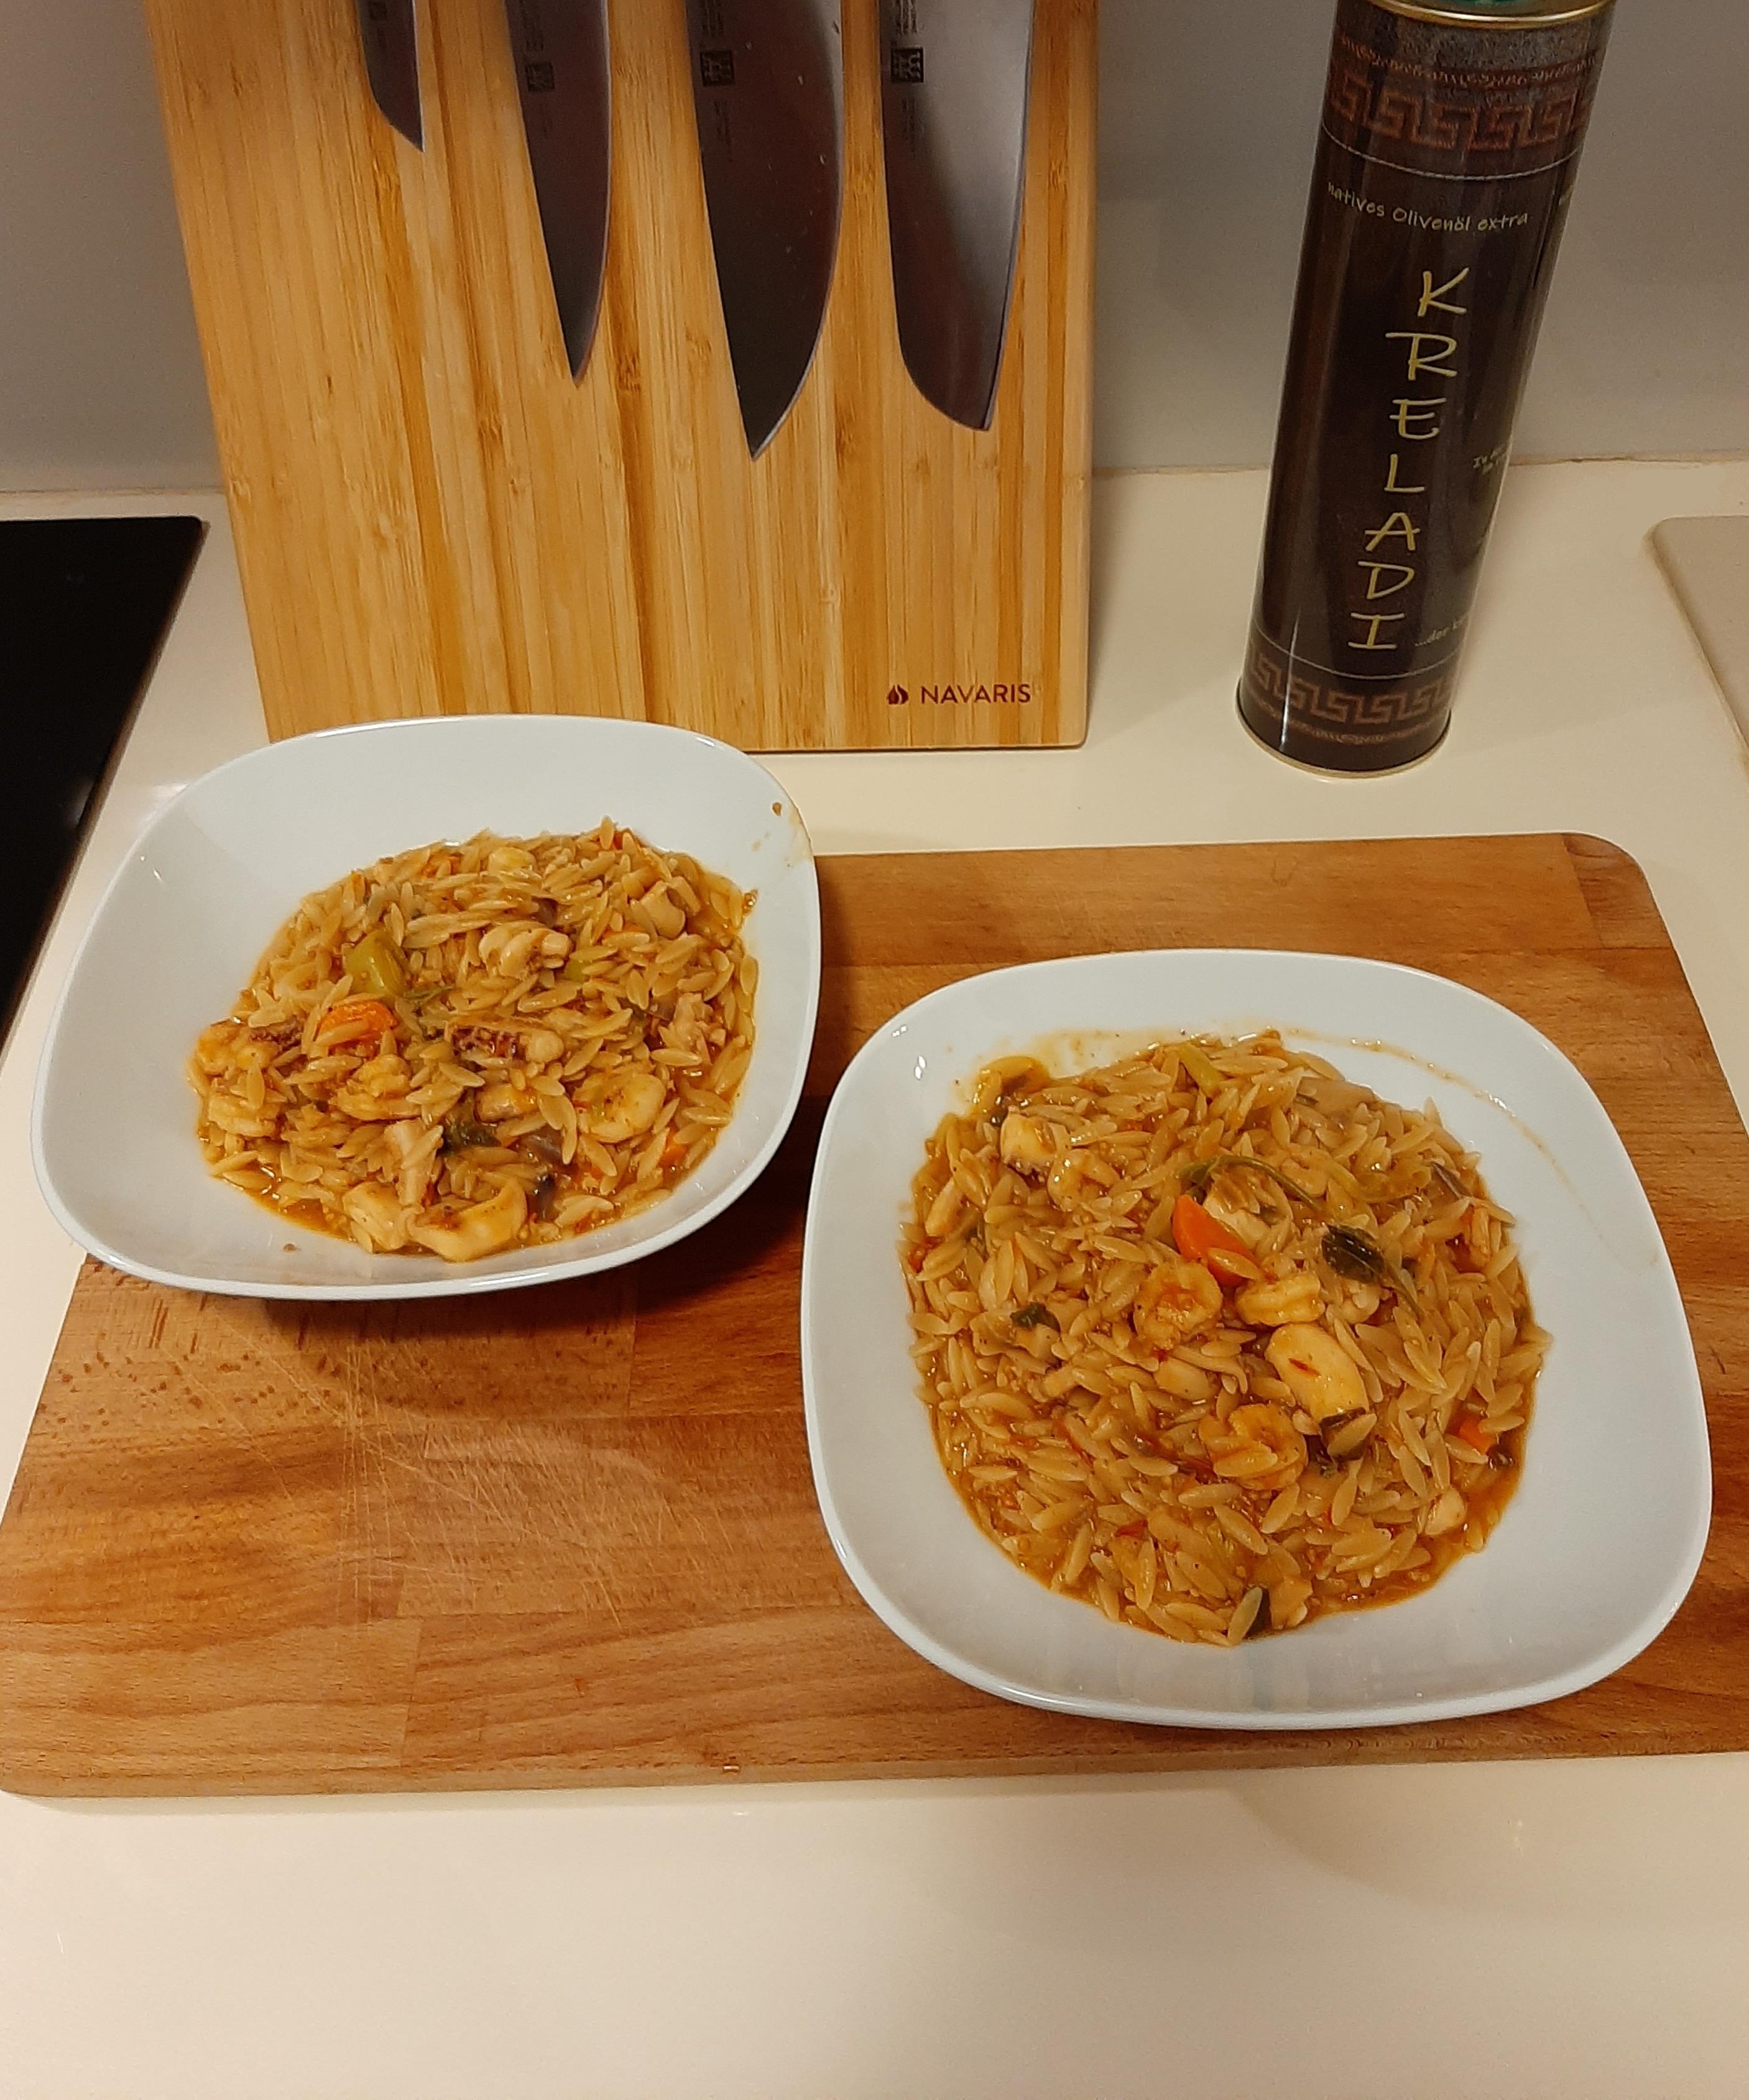 Seafood Pasta mit Shrimps und Kalamari